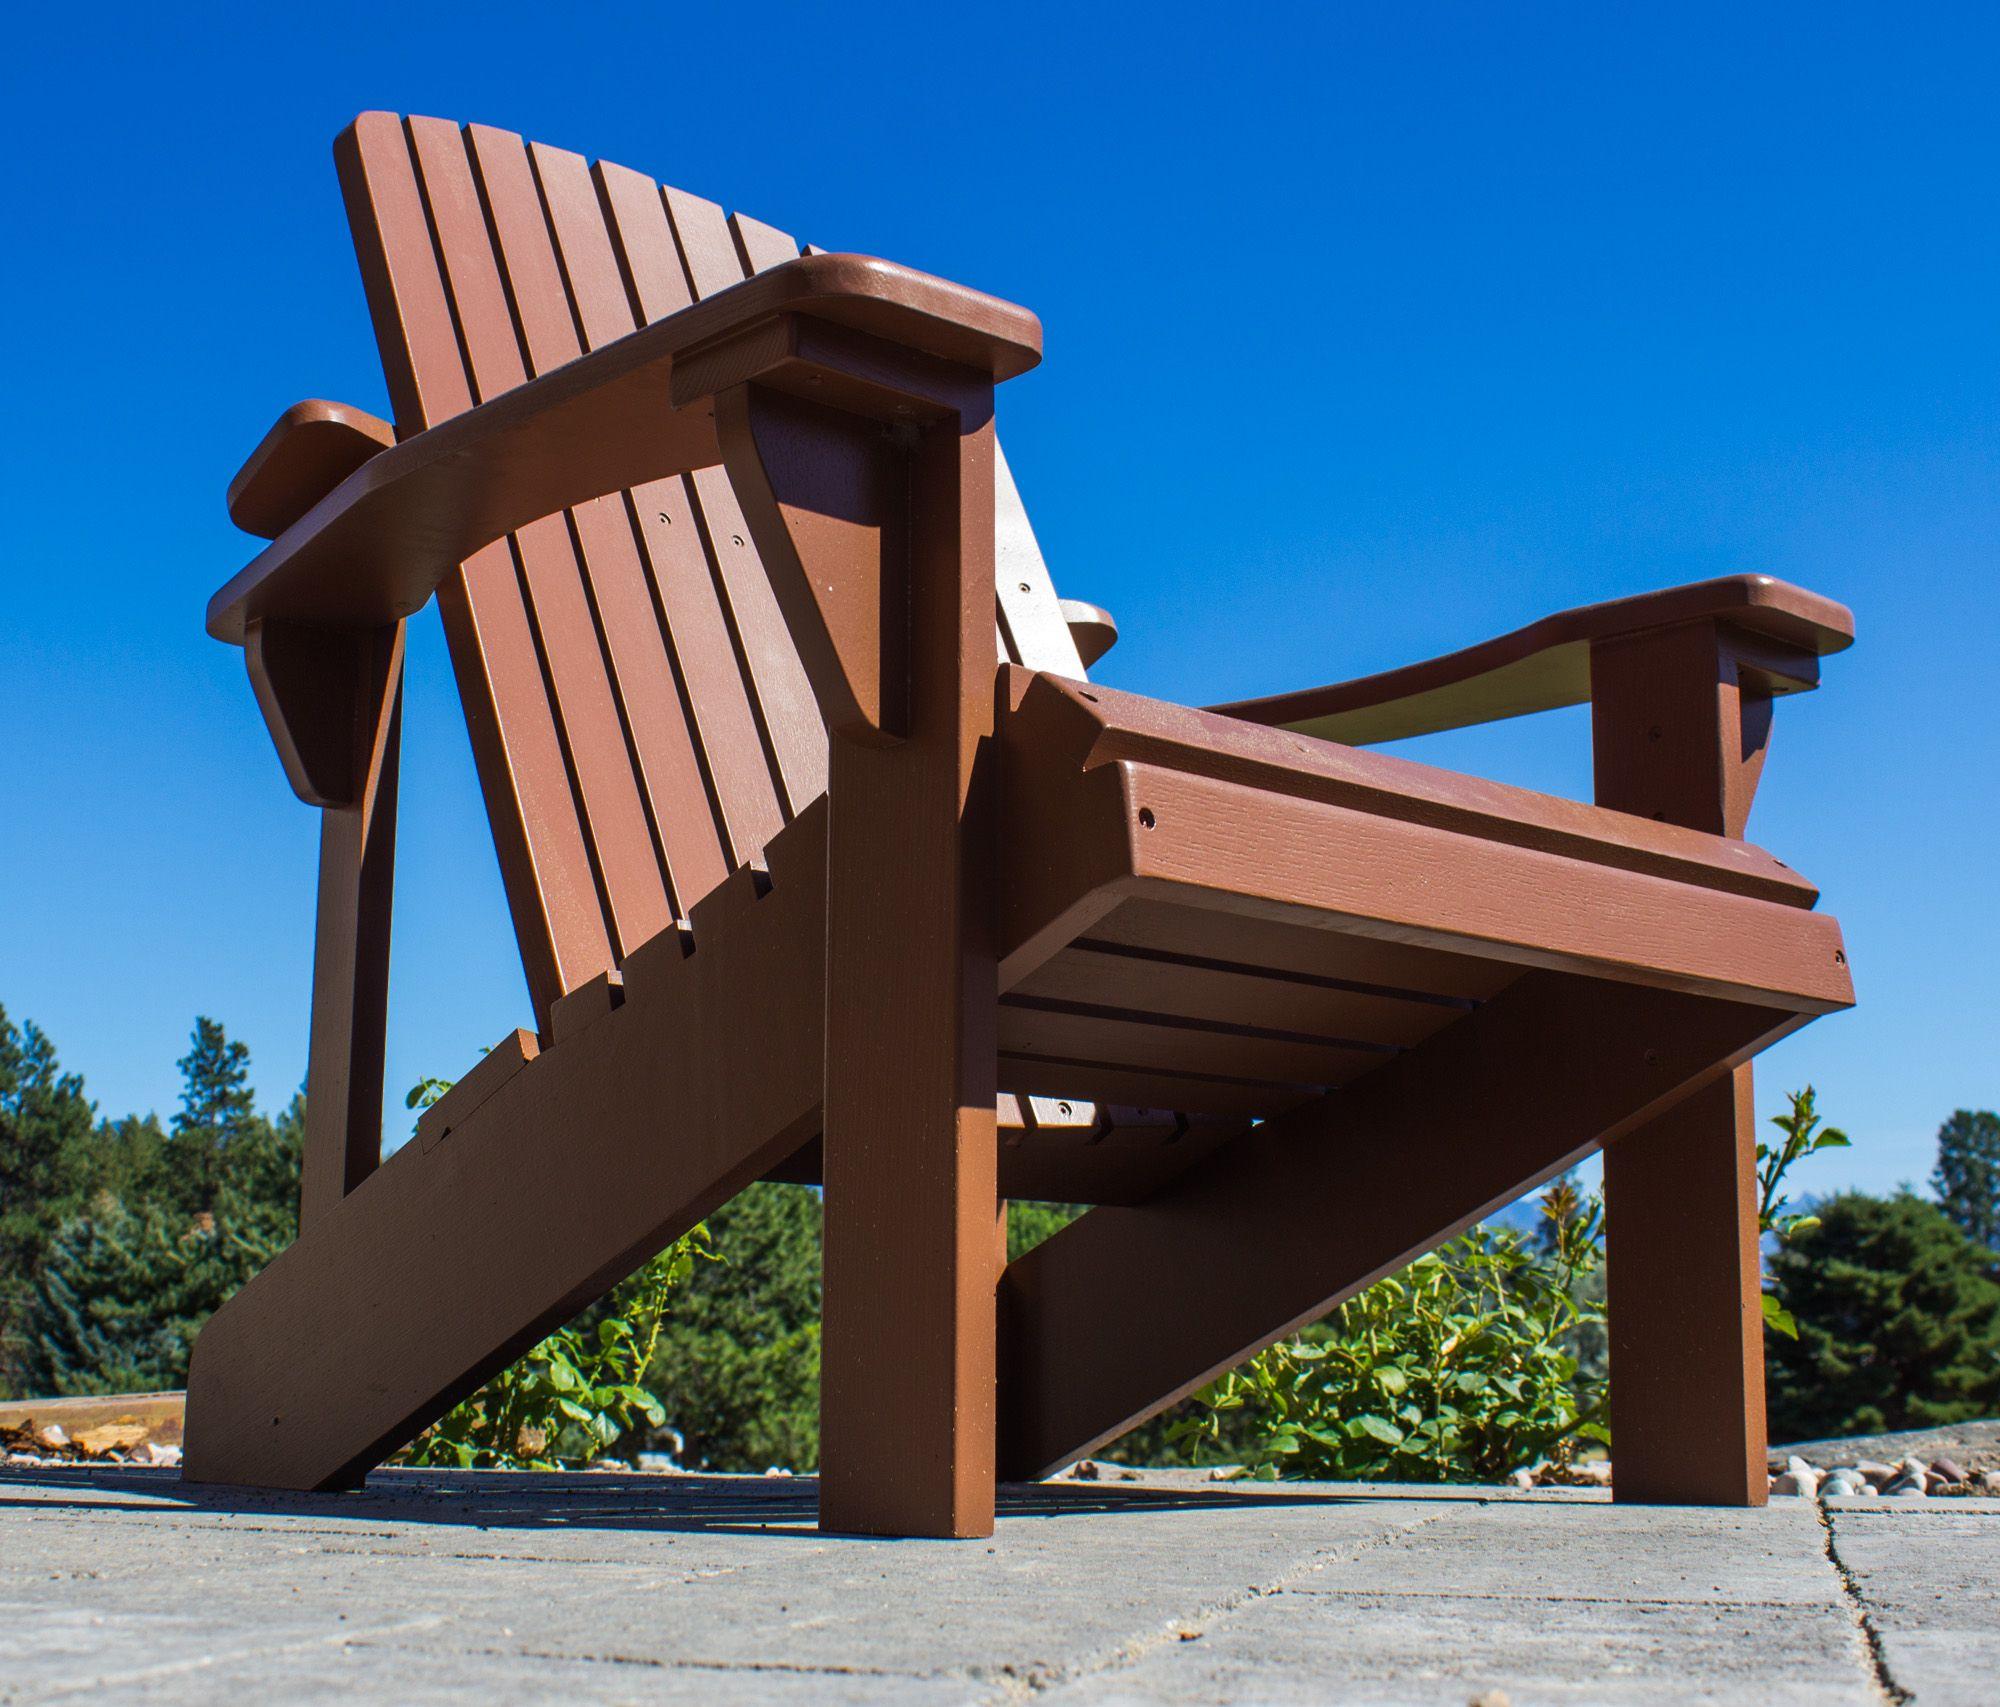 Marvelous Buy A Handmade White Oak Painted Adirondack Chair Made To Creativecarmelina Interior Chair Design Creativecarmelinacom